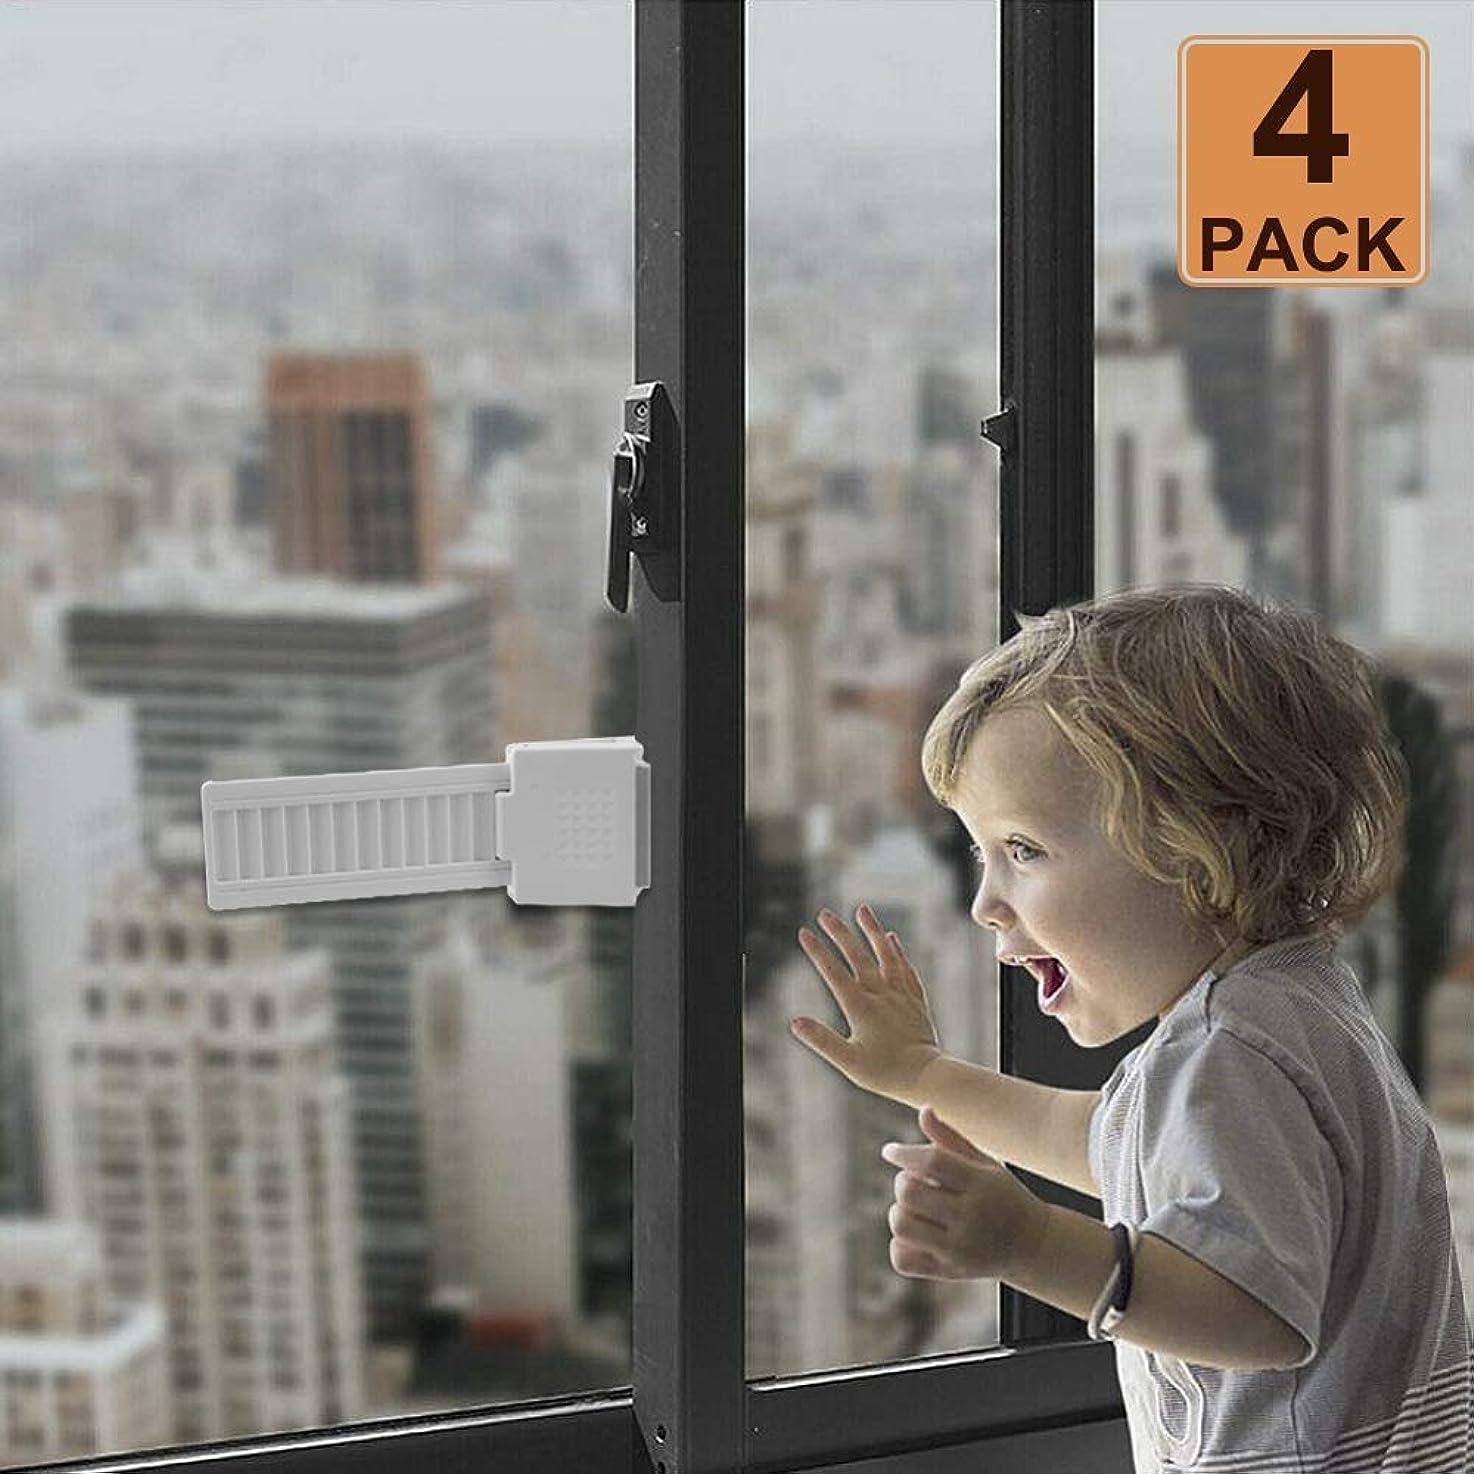 OFUN Sliding Glass Door Locks, Sliding Window Locks, Baby Proof Lock with Strong Acrylic Adhesive, Patented Design, 4 Packs, White